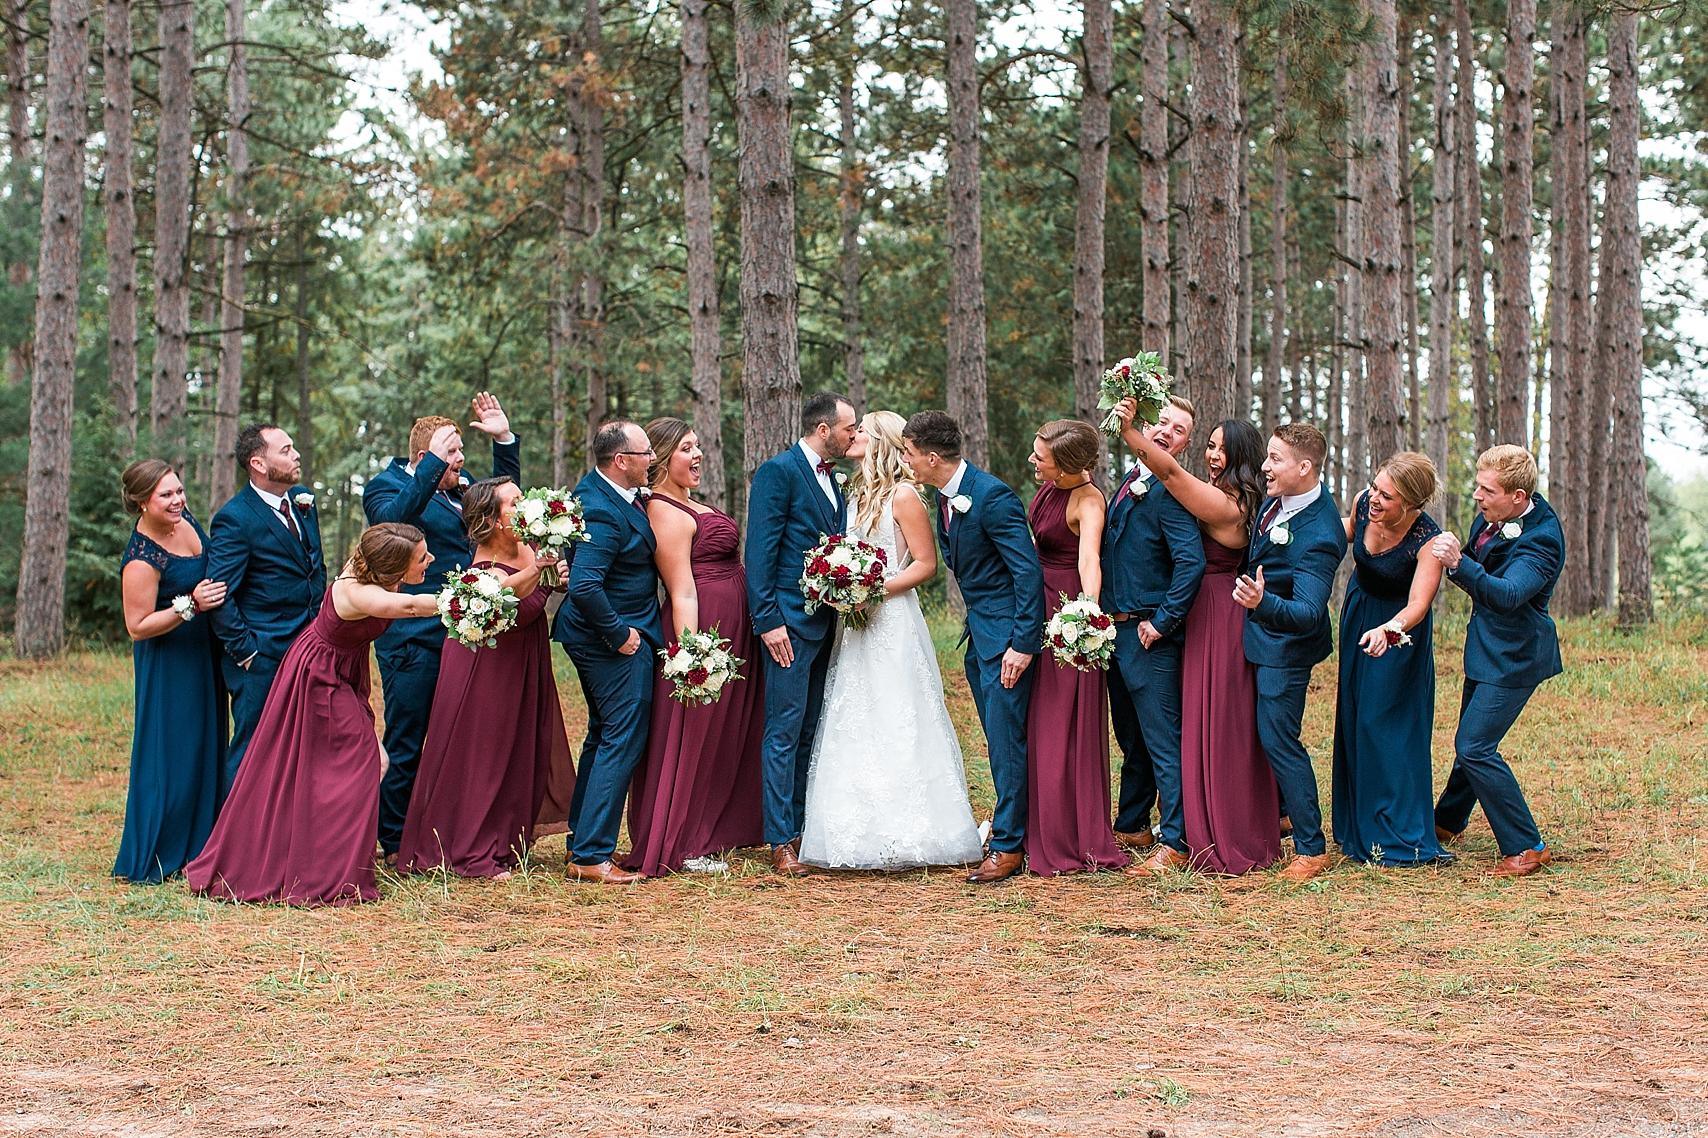 Minnesota Minneapolis Wedding Photographer Best Of 2018 Weddings Mallory Kiesow Photography_0169.jpg